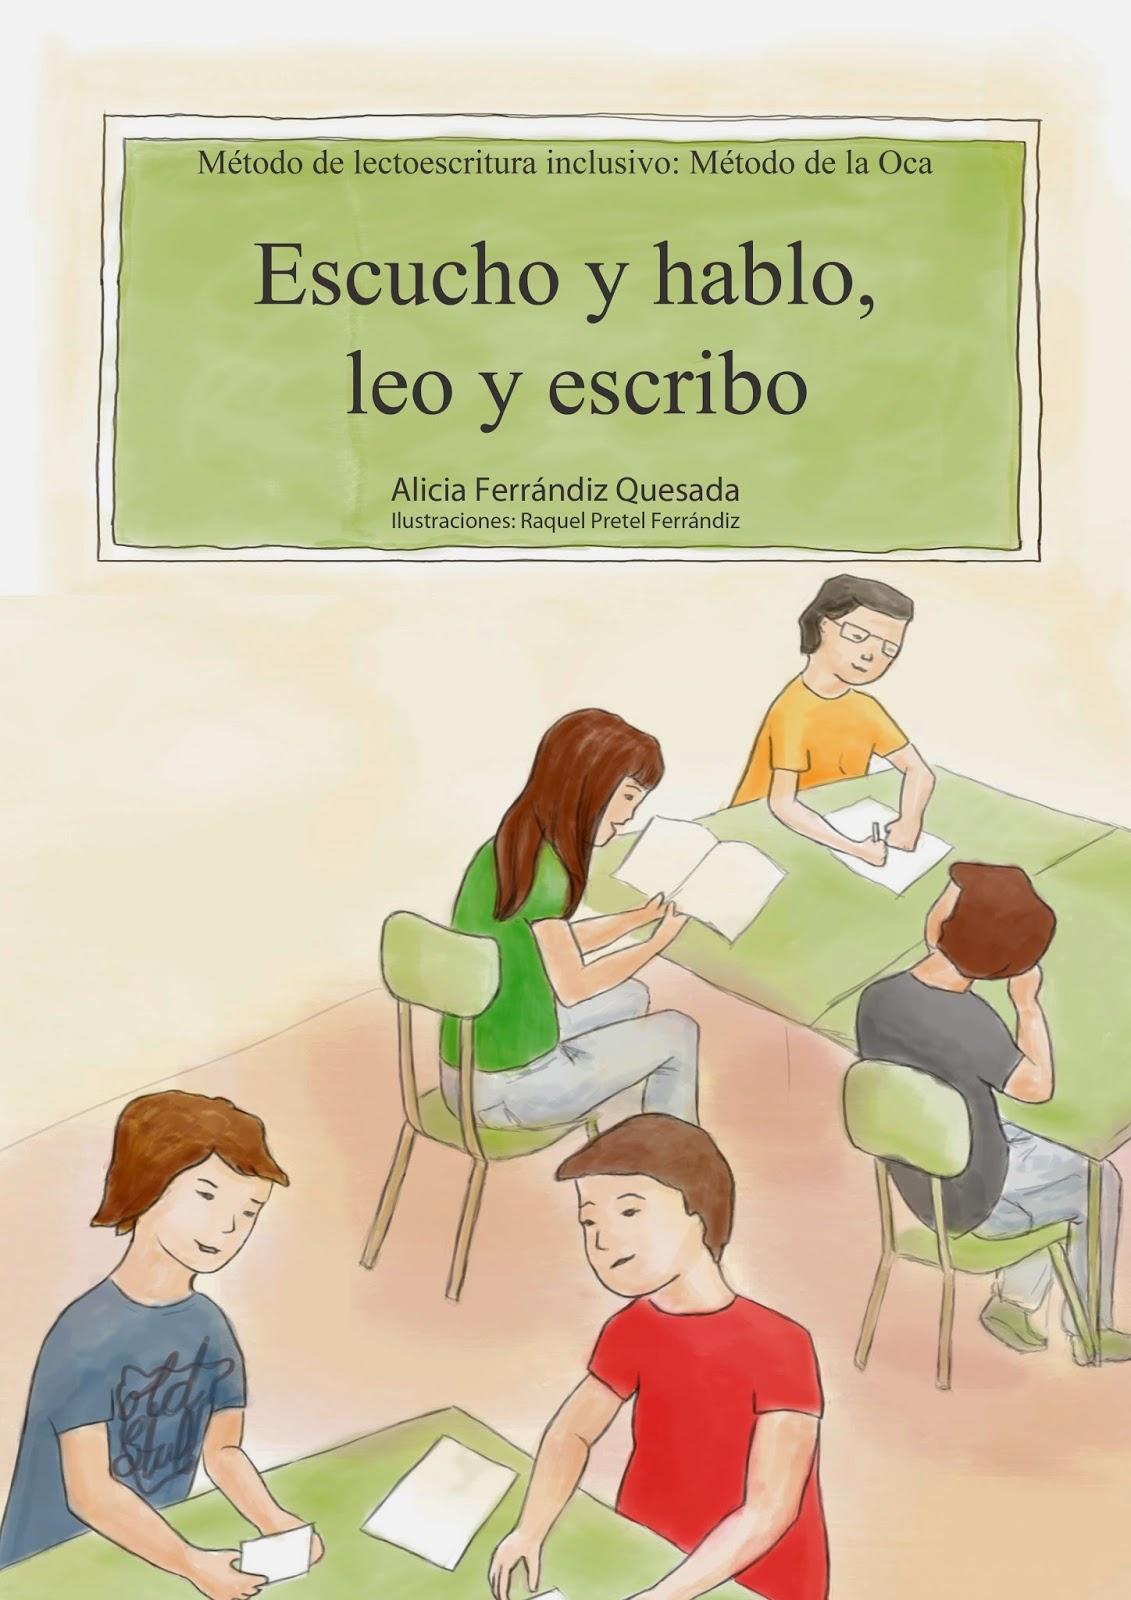 http://www.barnesandnoble.com/c/alicia-ferrandiz-quesada